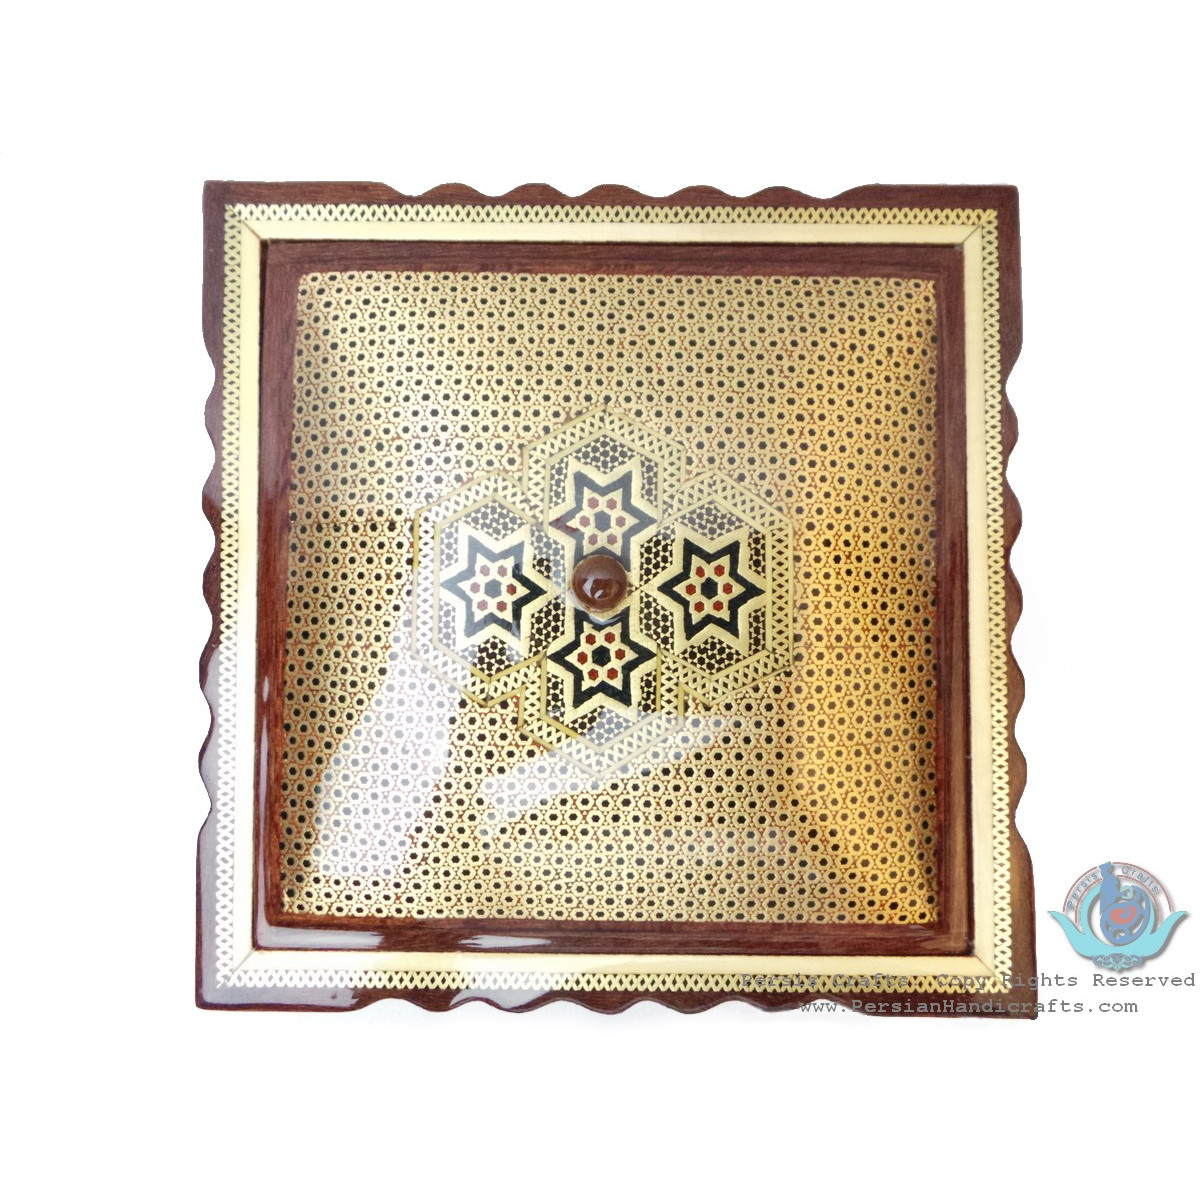 Khatam on Wood Candy/Nuts Dish - HKH3007-Persian Handicrafts